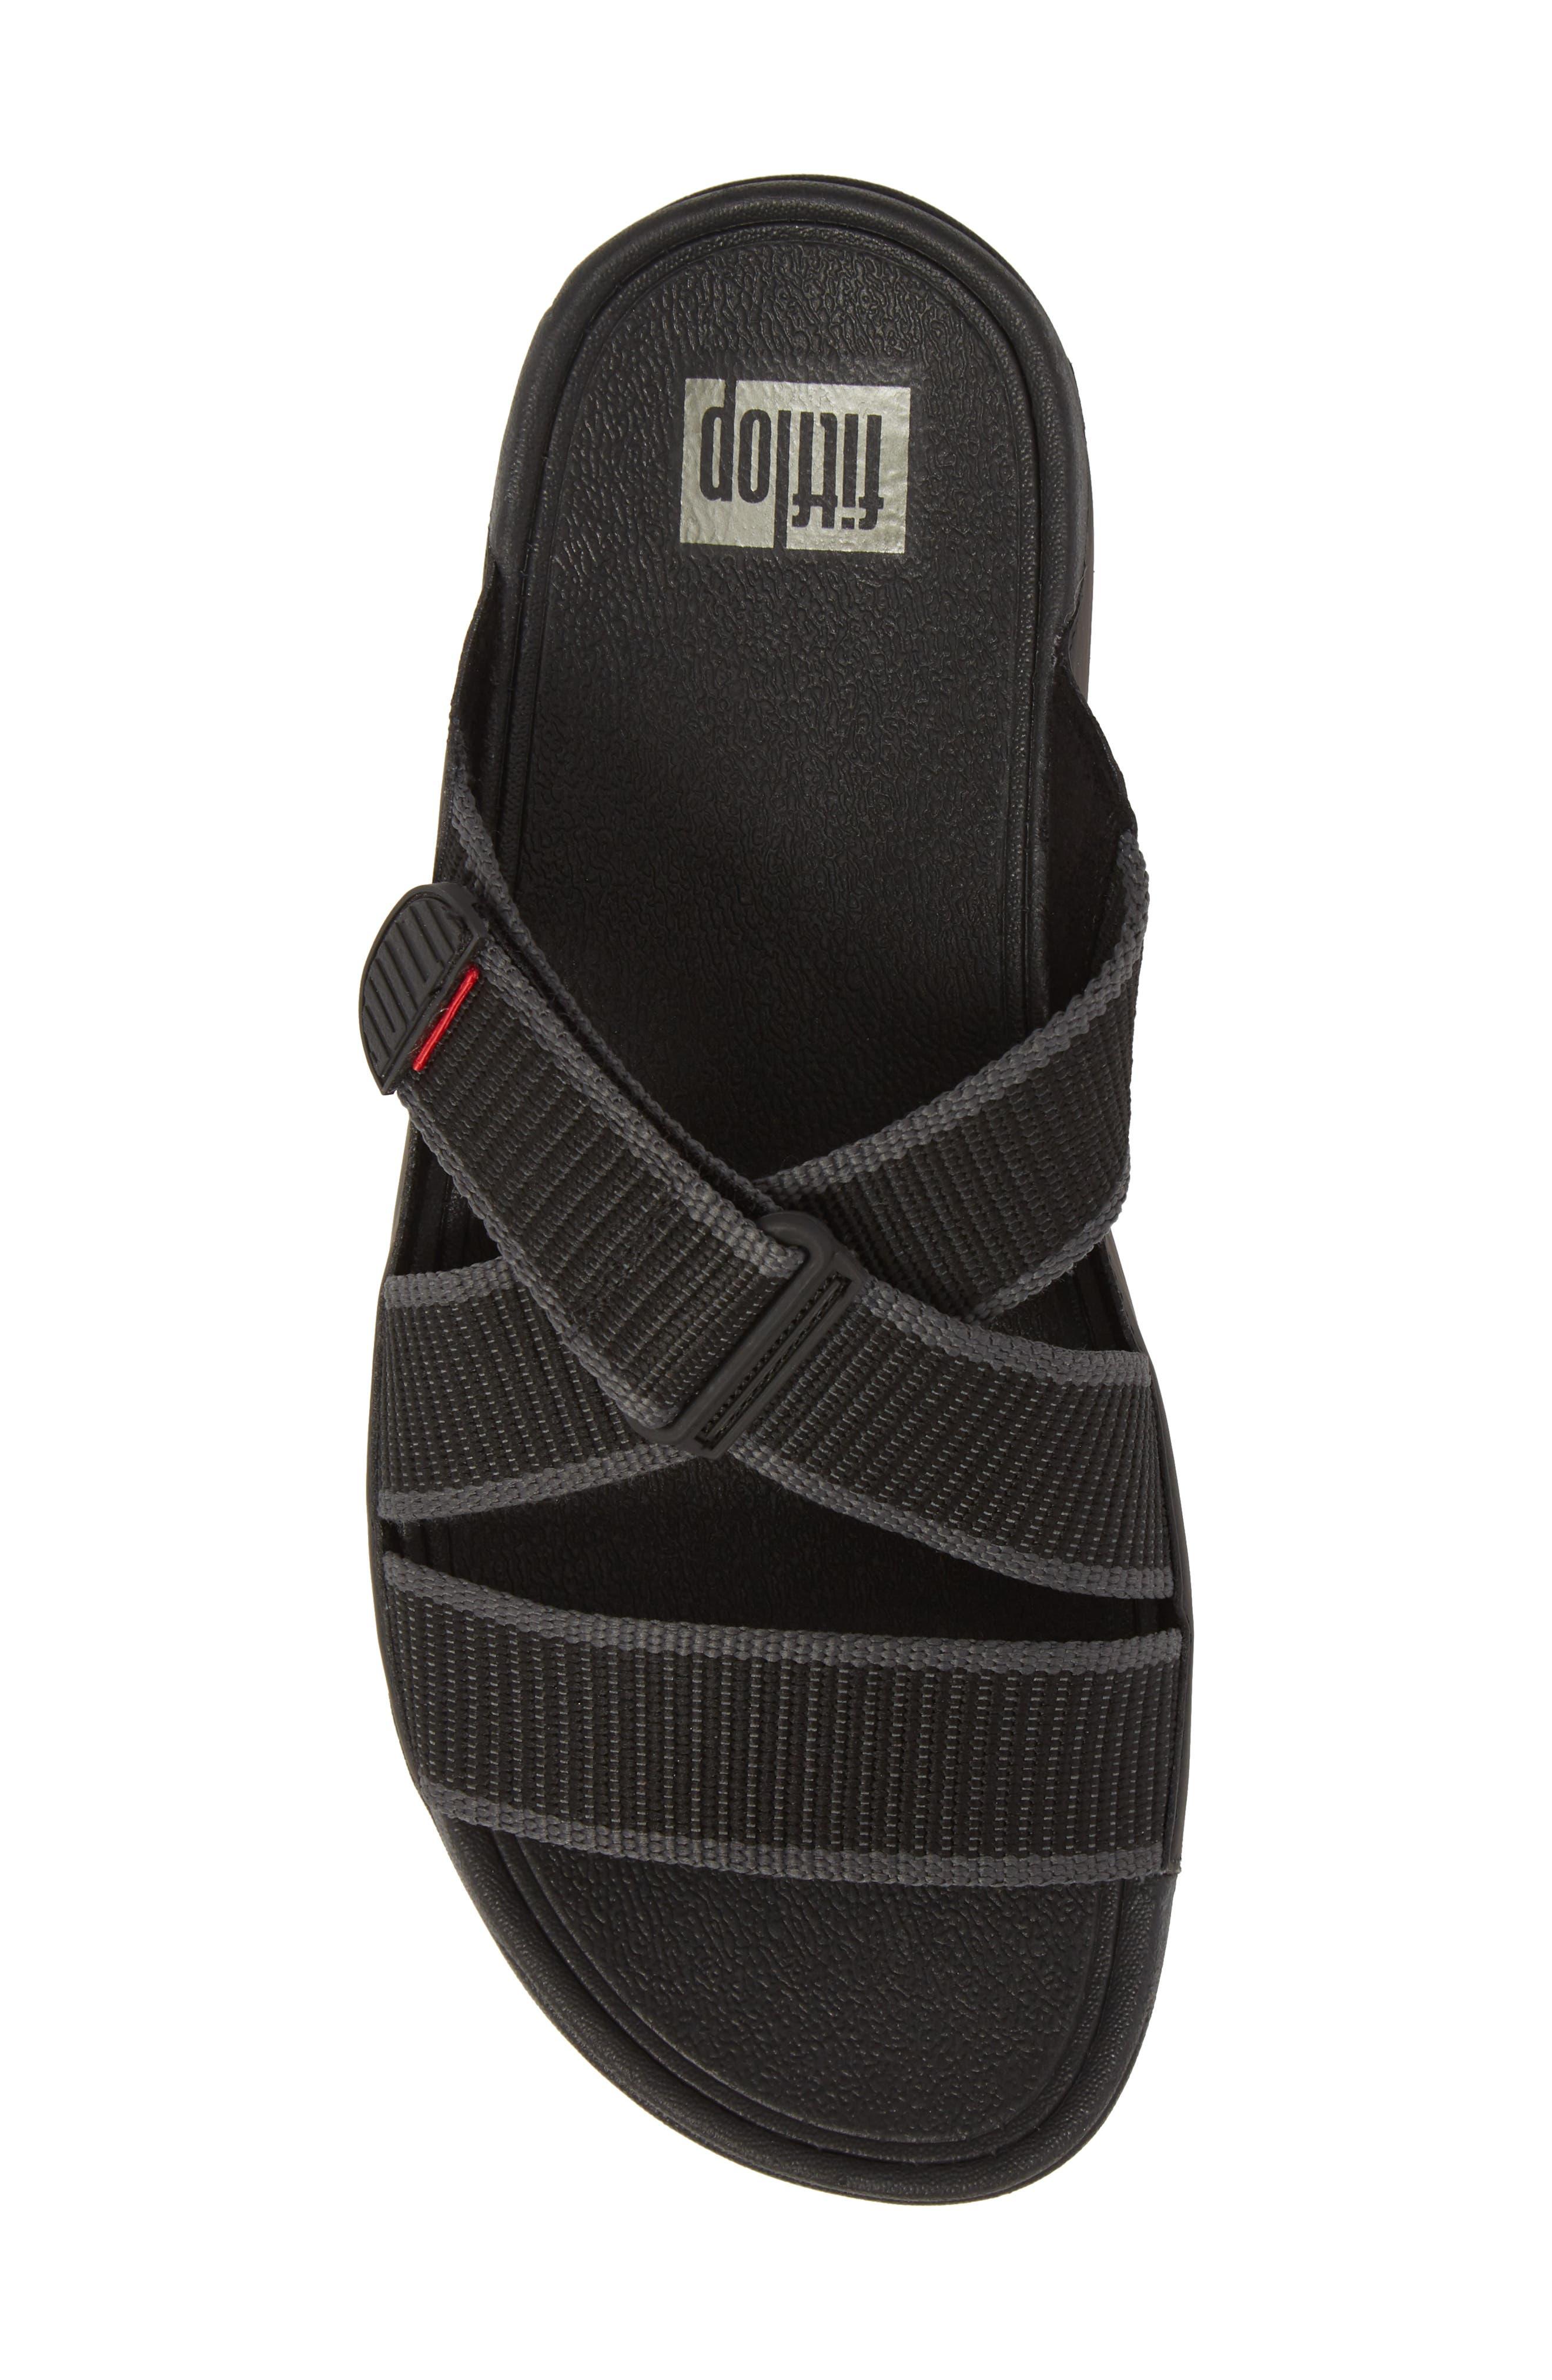 Sling II Slide Sandal,                             Alternate thumbnail 5, color,                             BLACK/ DARK SHADOW